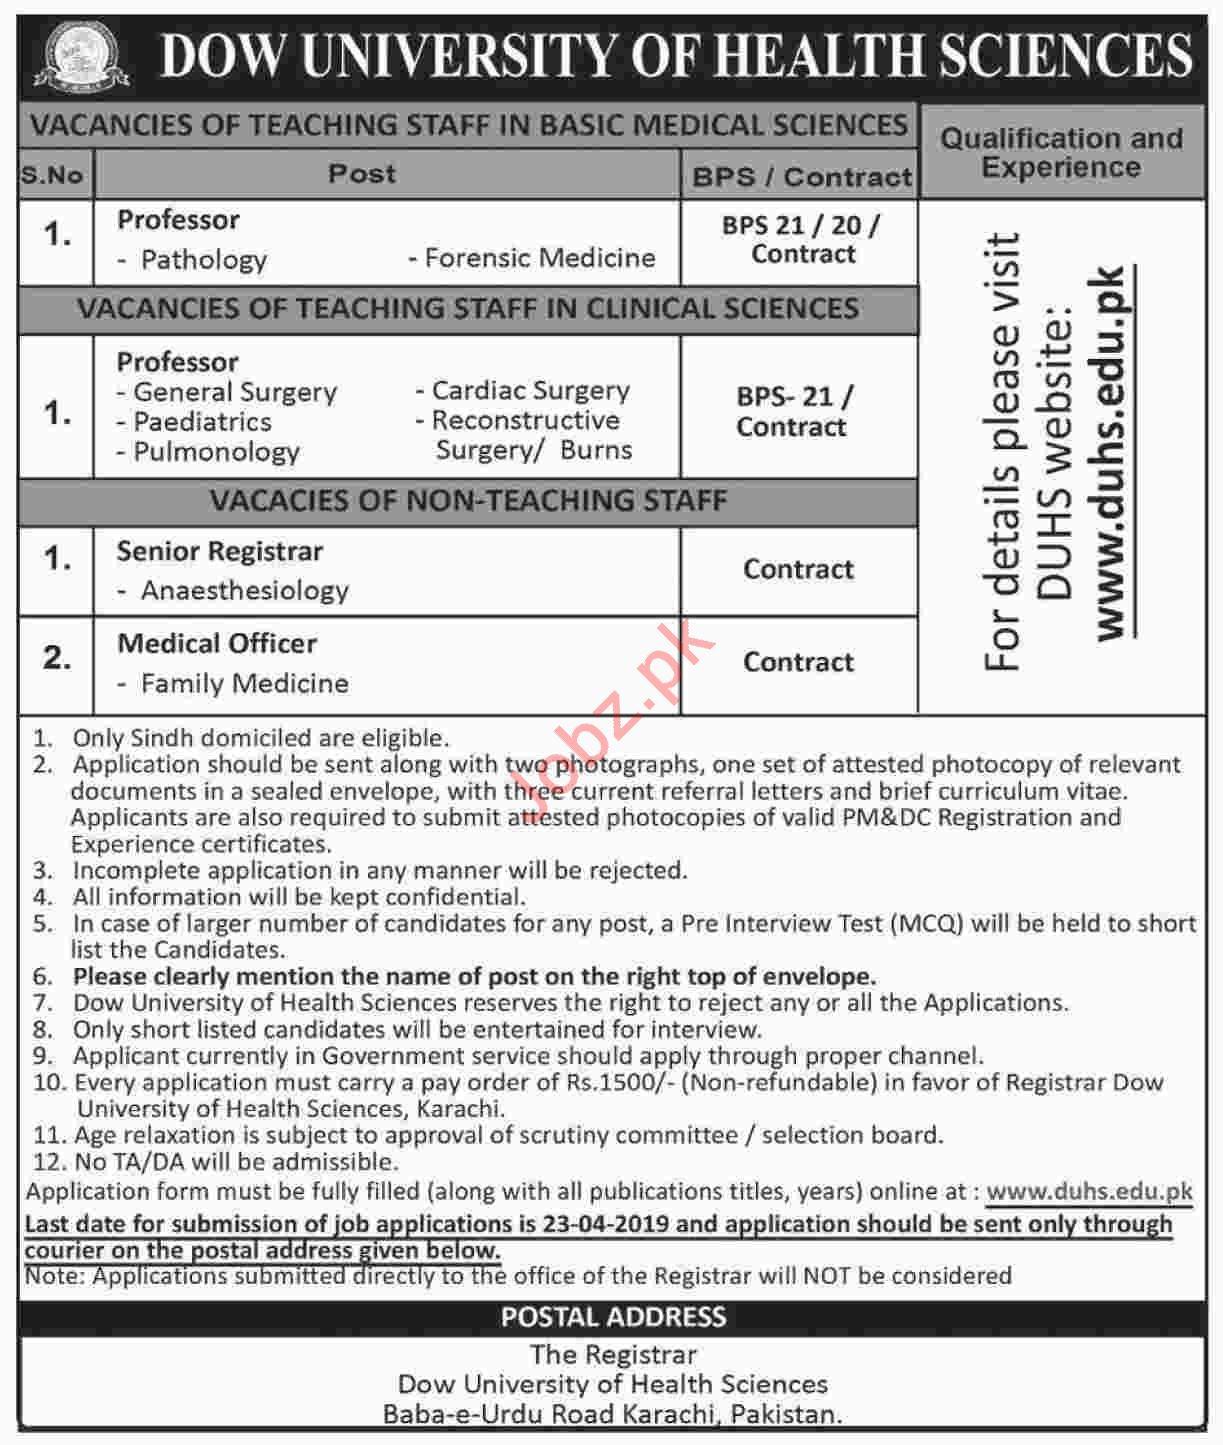 Dow University of Health Sciences DUHS Jobs 2019 in Karachi